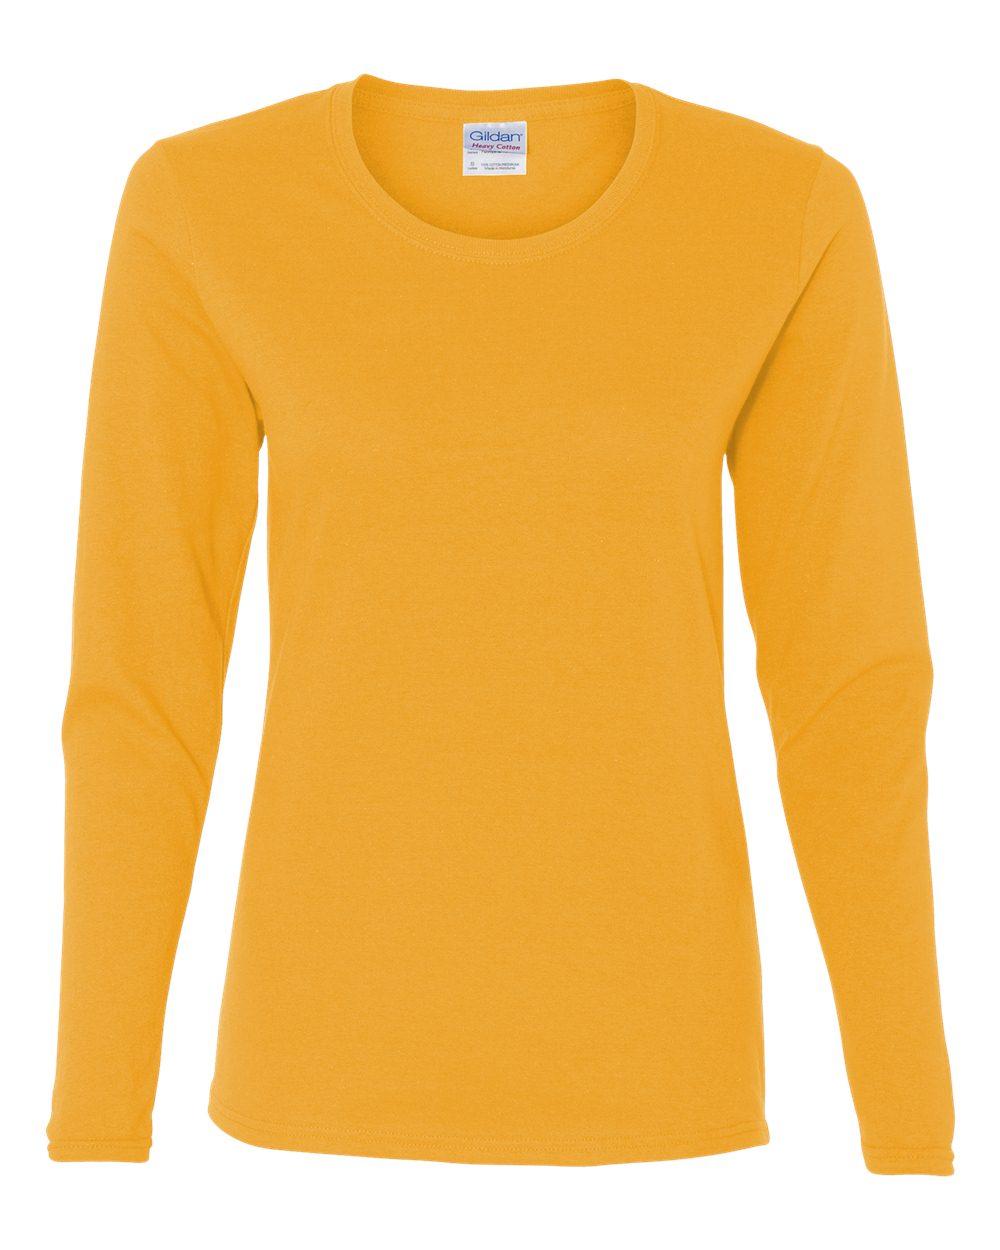 Gildan - Heavy Cotton Women's Long Sleeve T-Shirt - 5400L